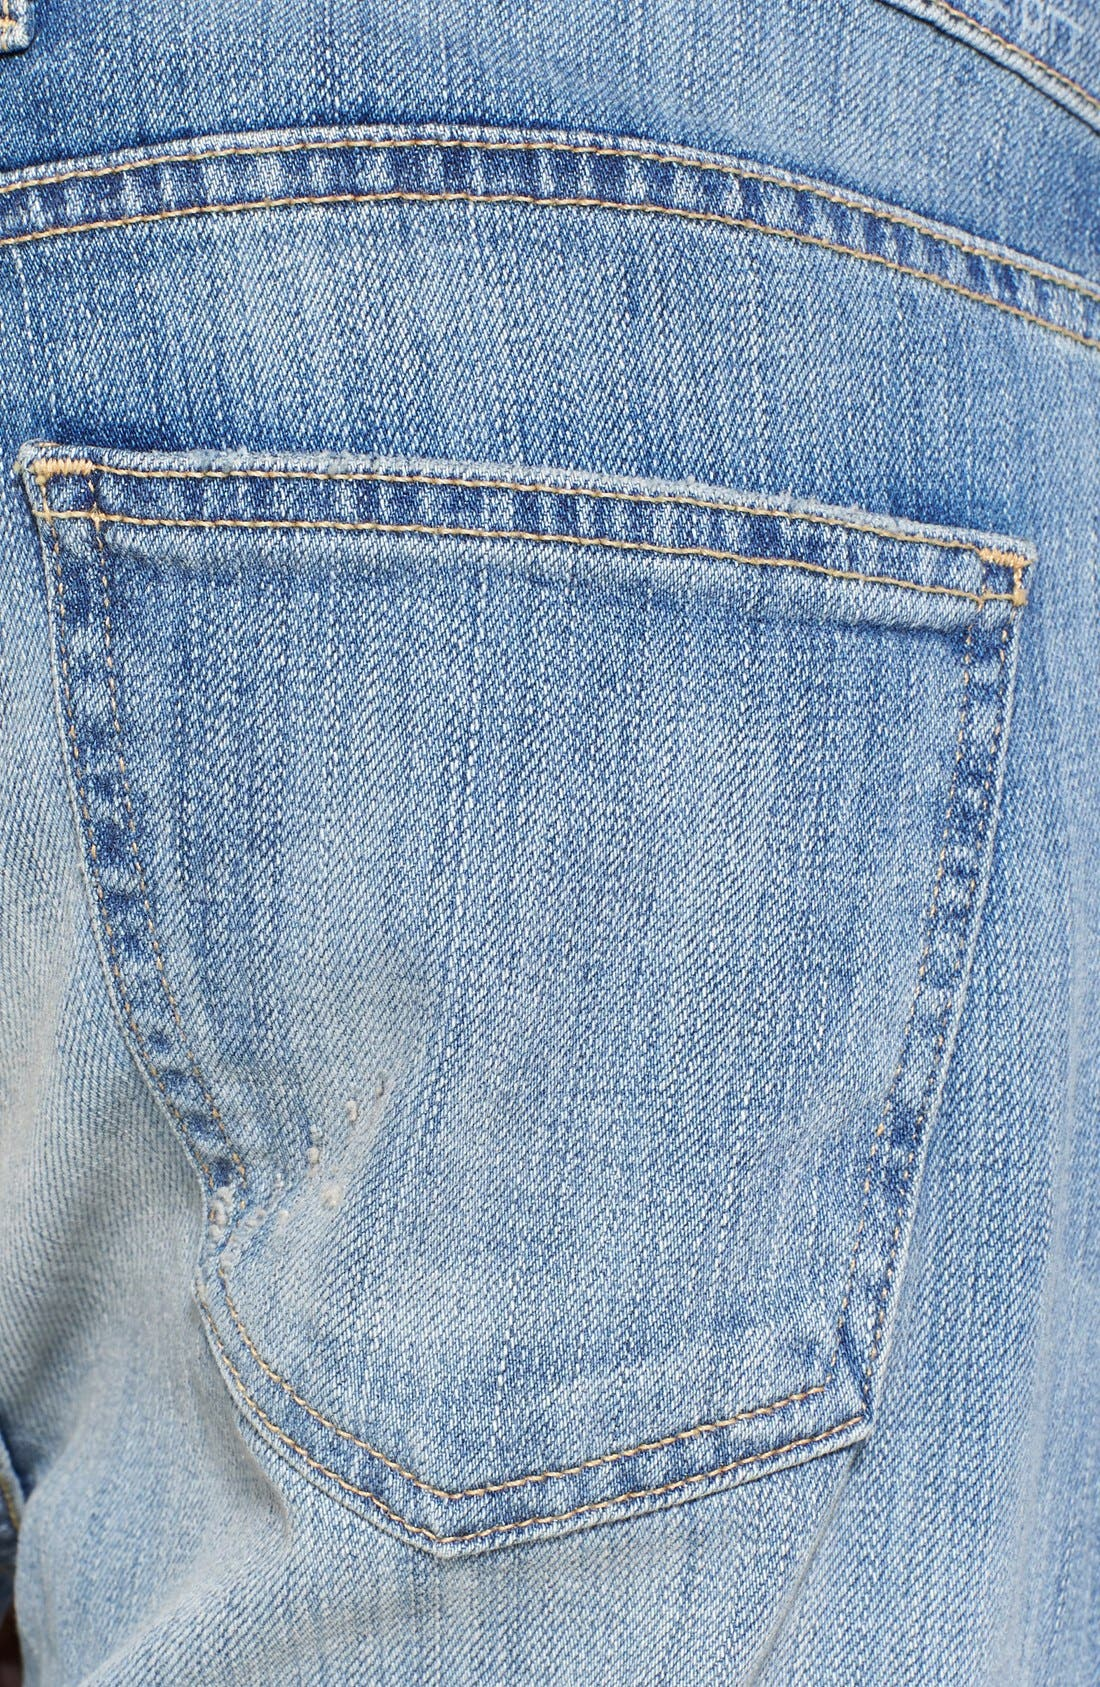 'The Fling' Boyfriend Jeans,                             Alternate thumbnail 3, color,                             Super Loved Destroy